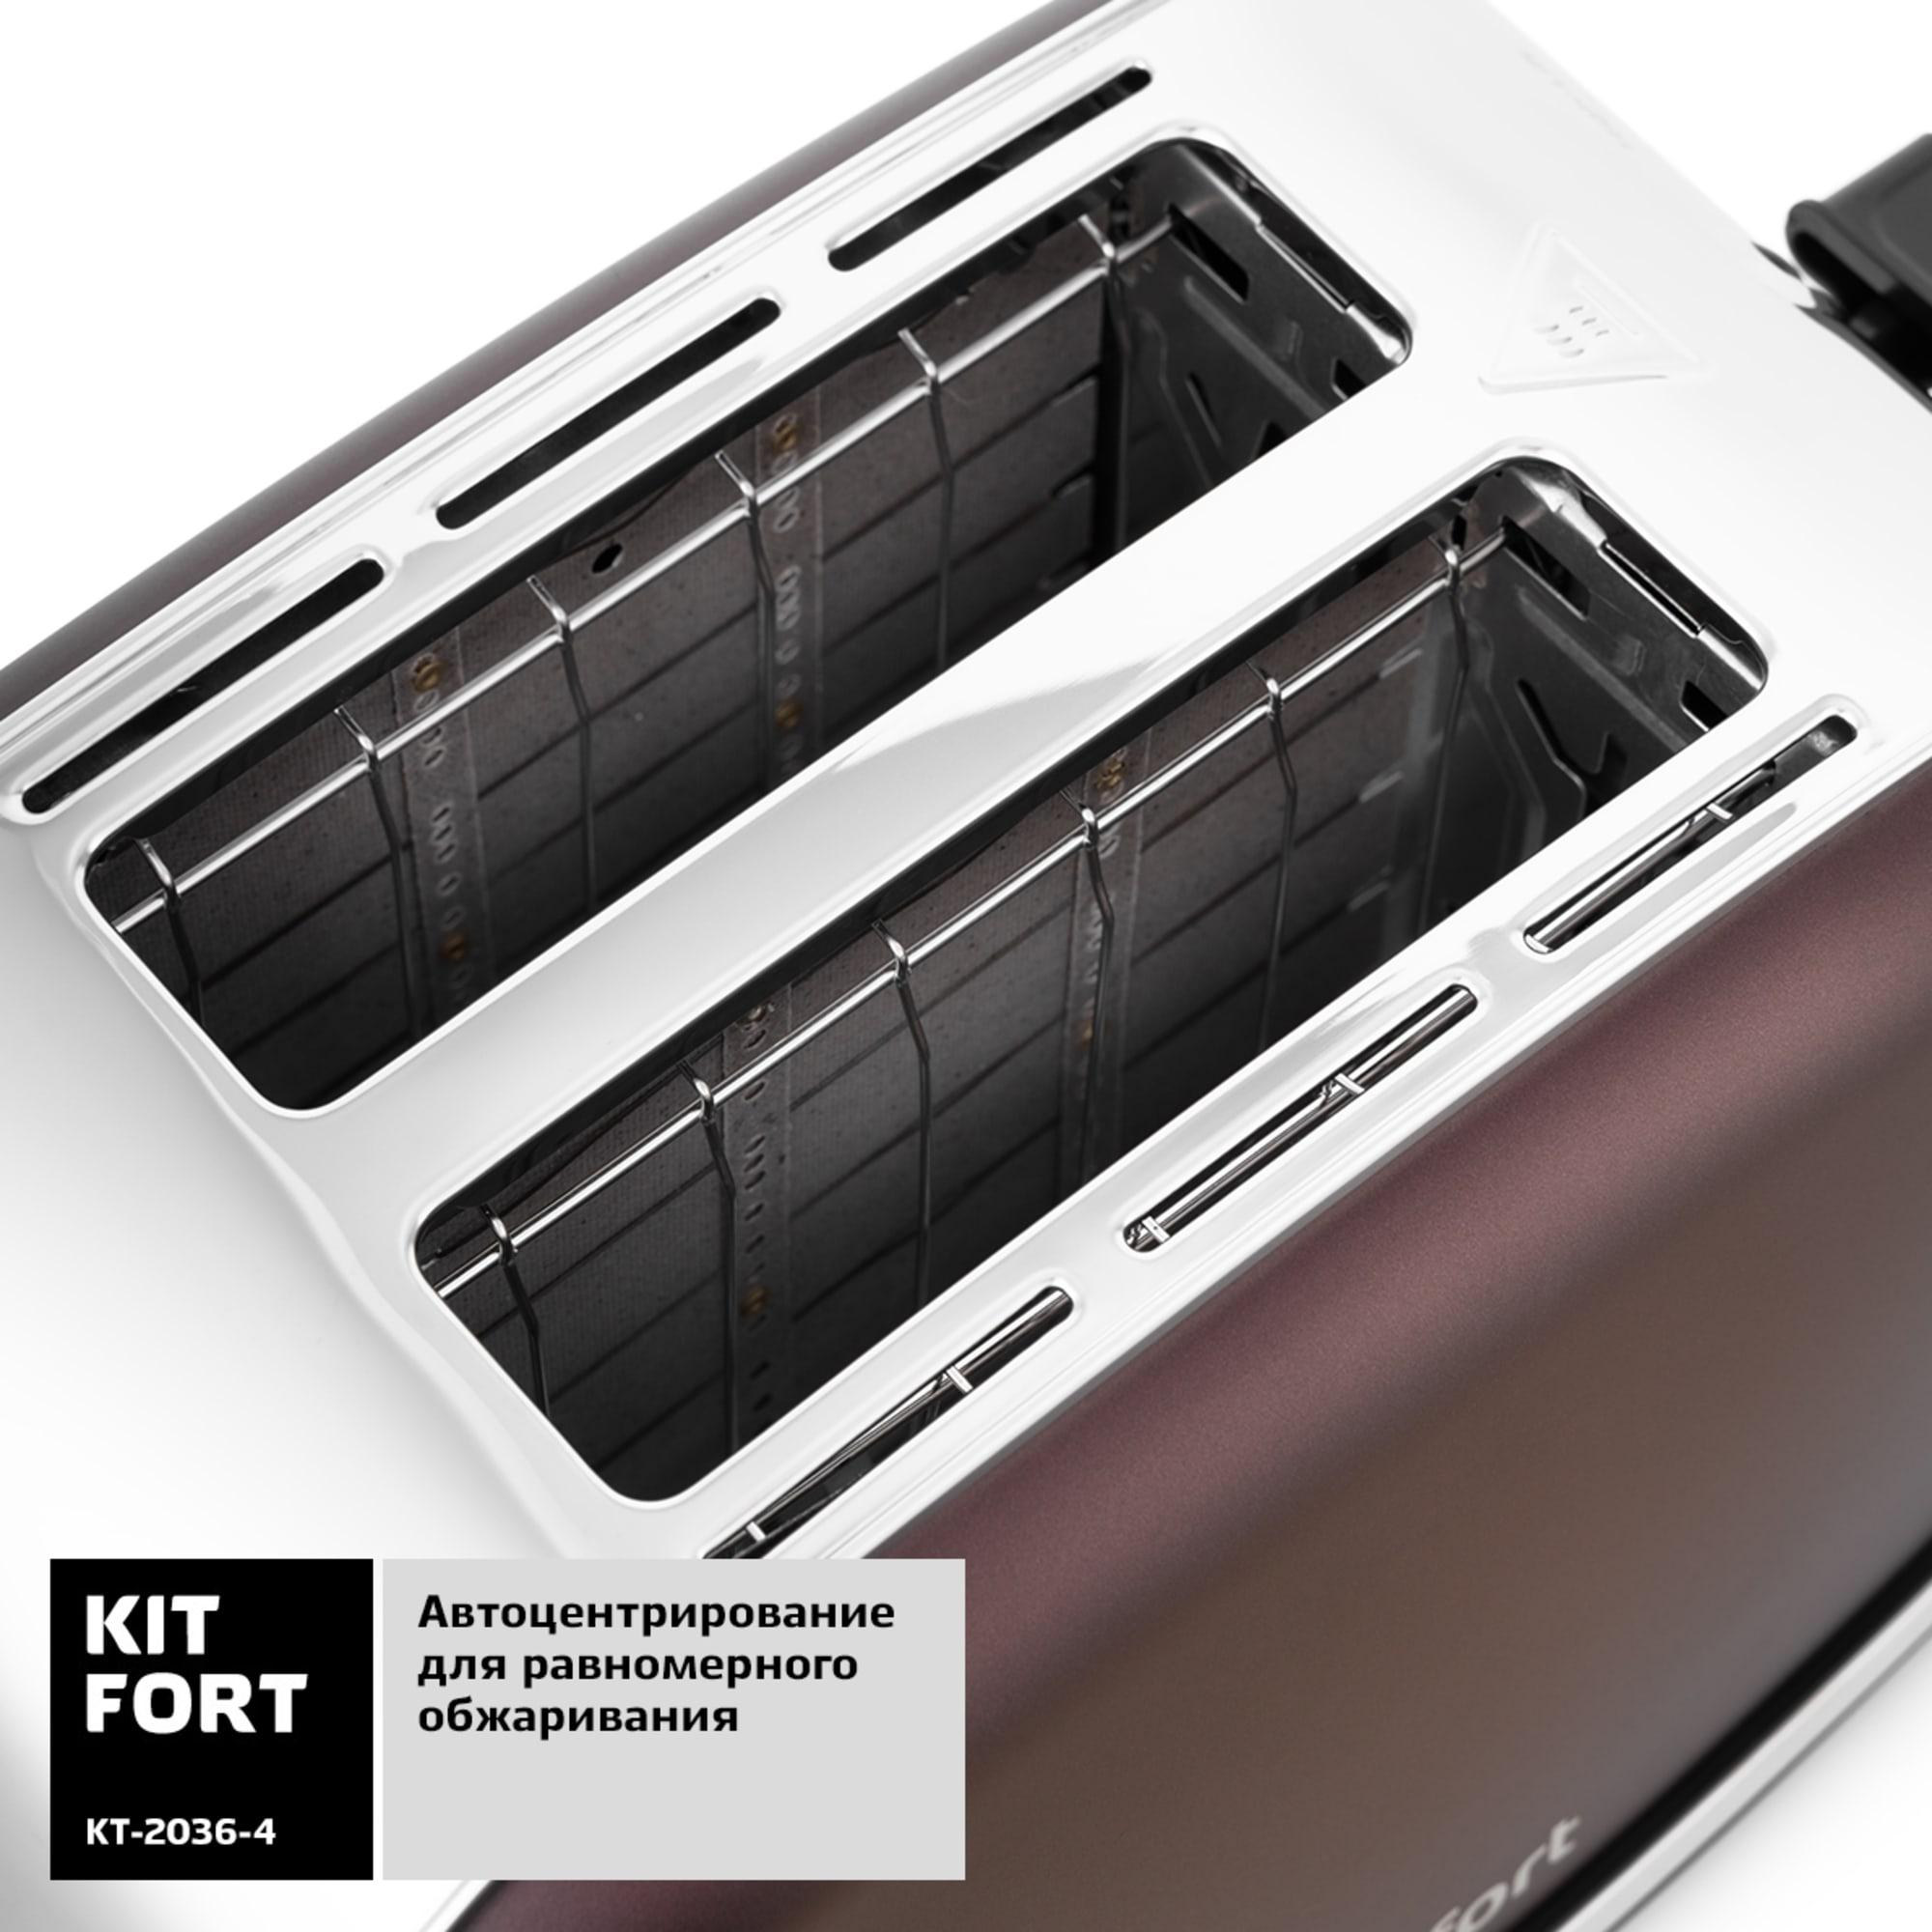 Kitfort KT-2036-4 Dark Coffee